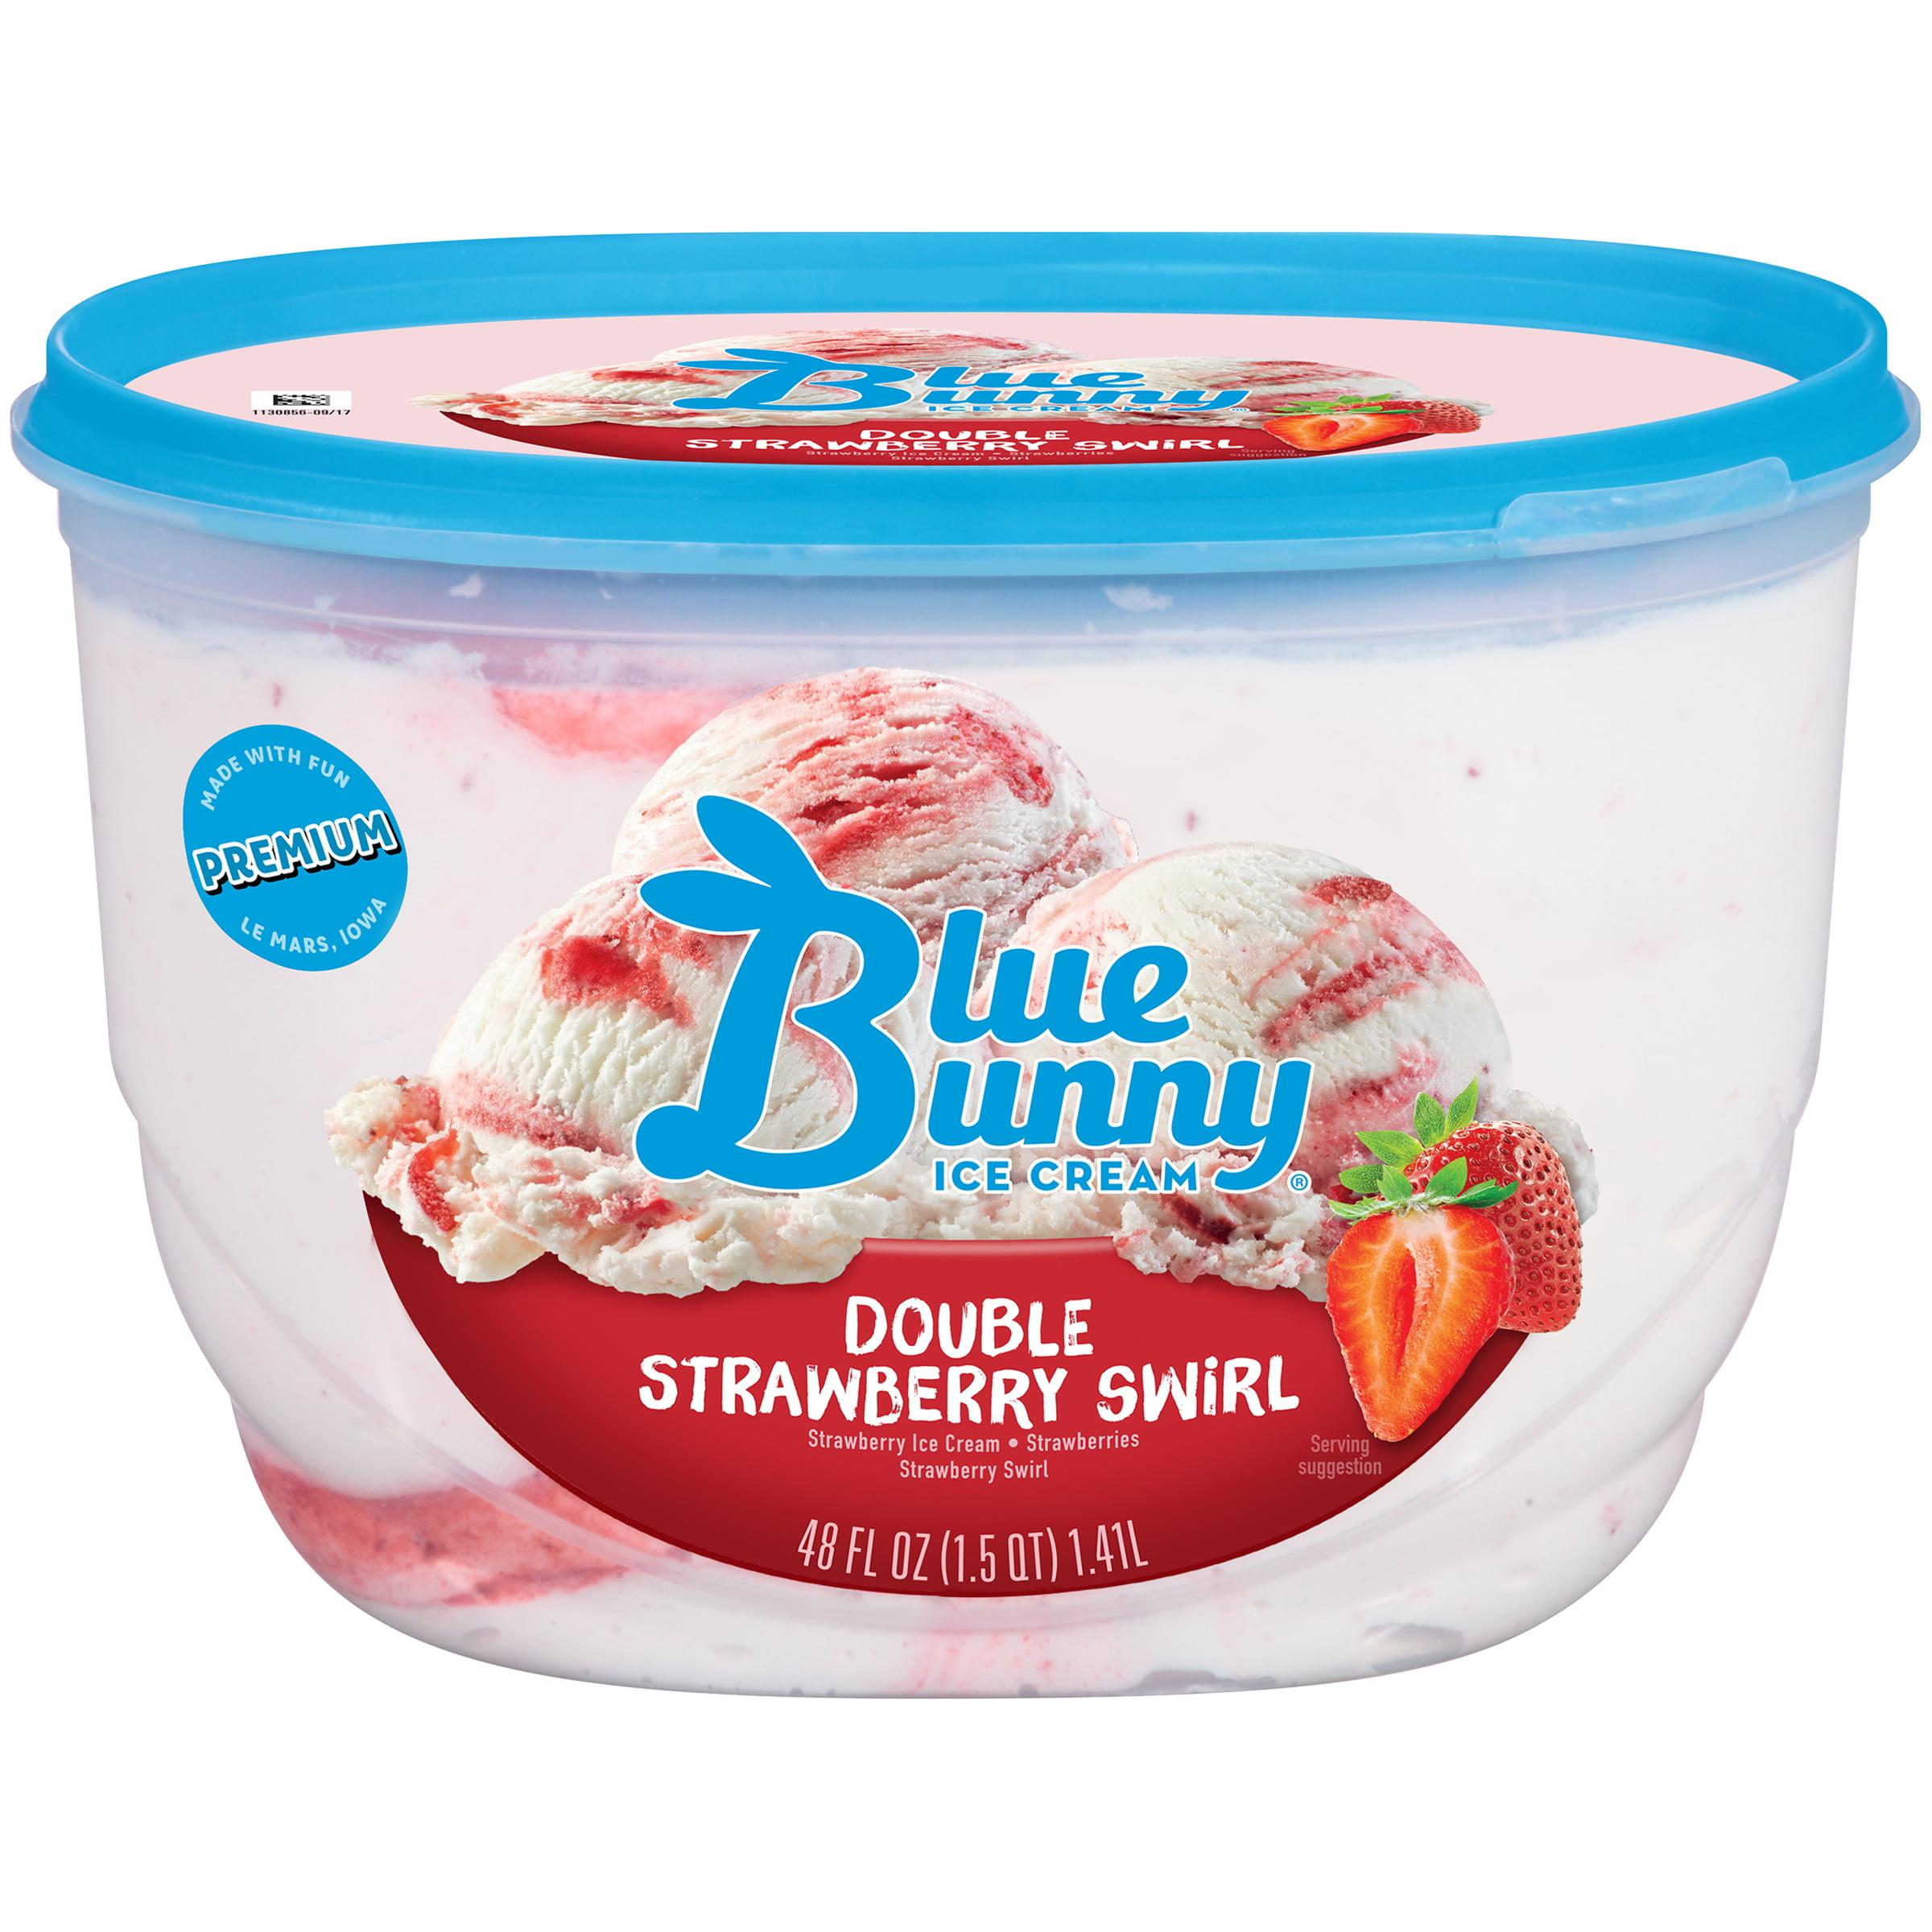 Blue Bunny Double Strawberry Ice Cream, 48 fl oz - Walmart.com